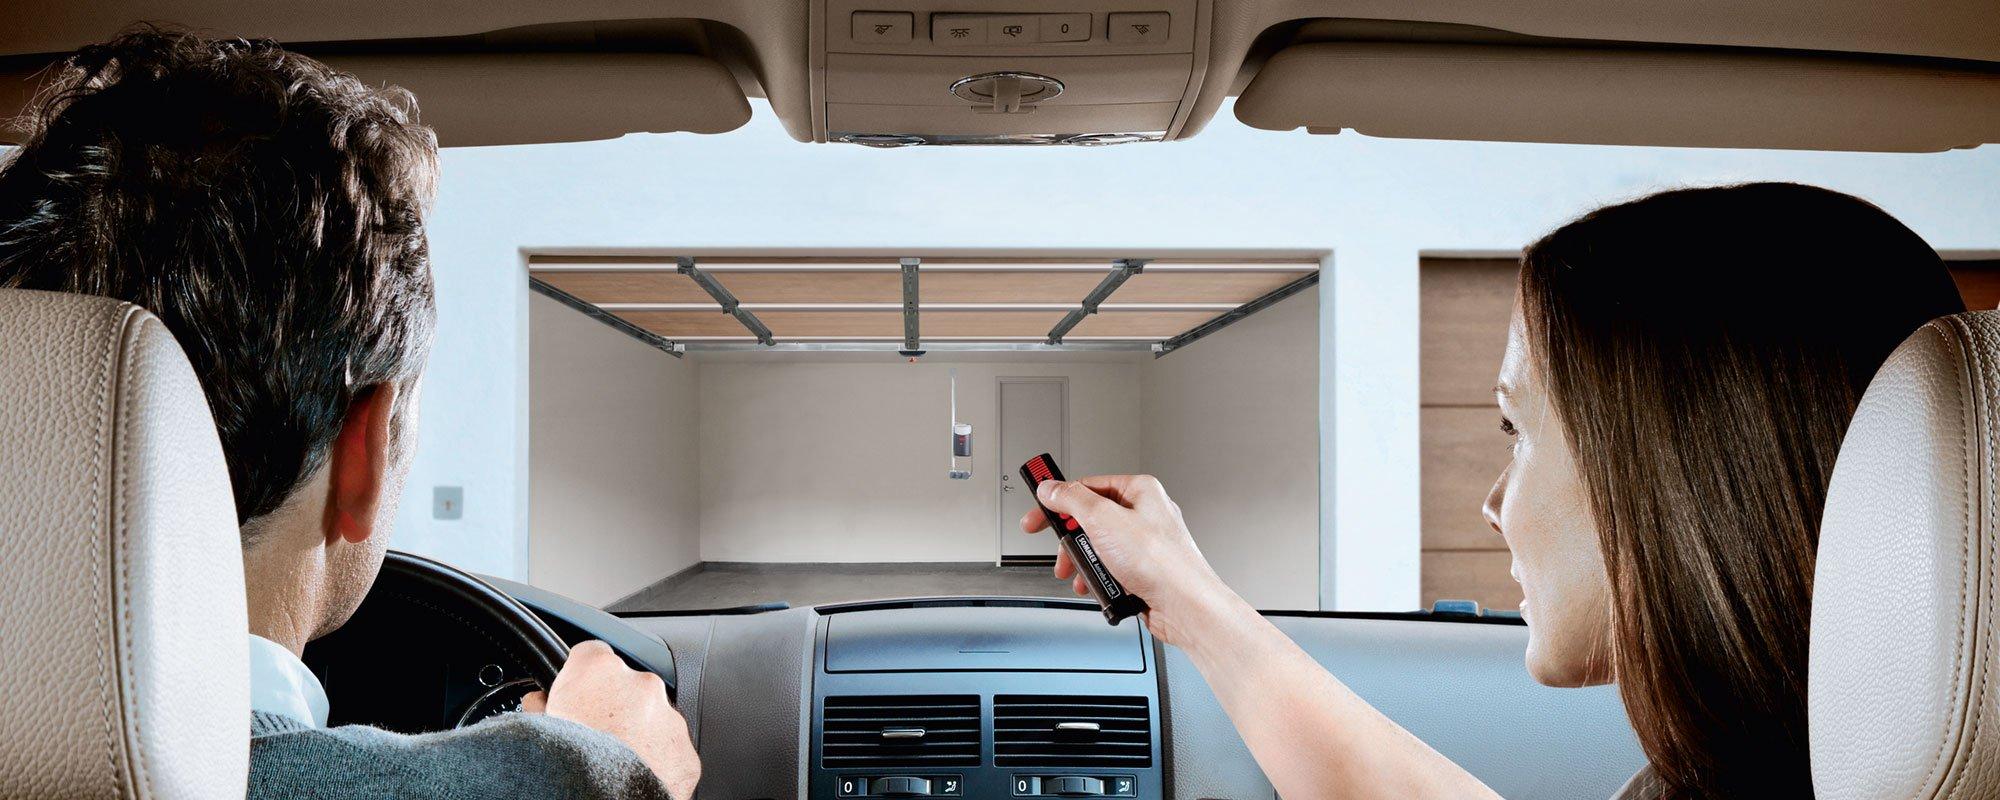 Automated garage door installed in sussex